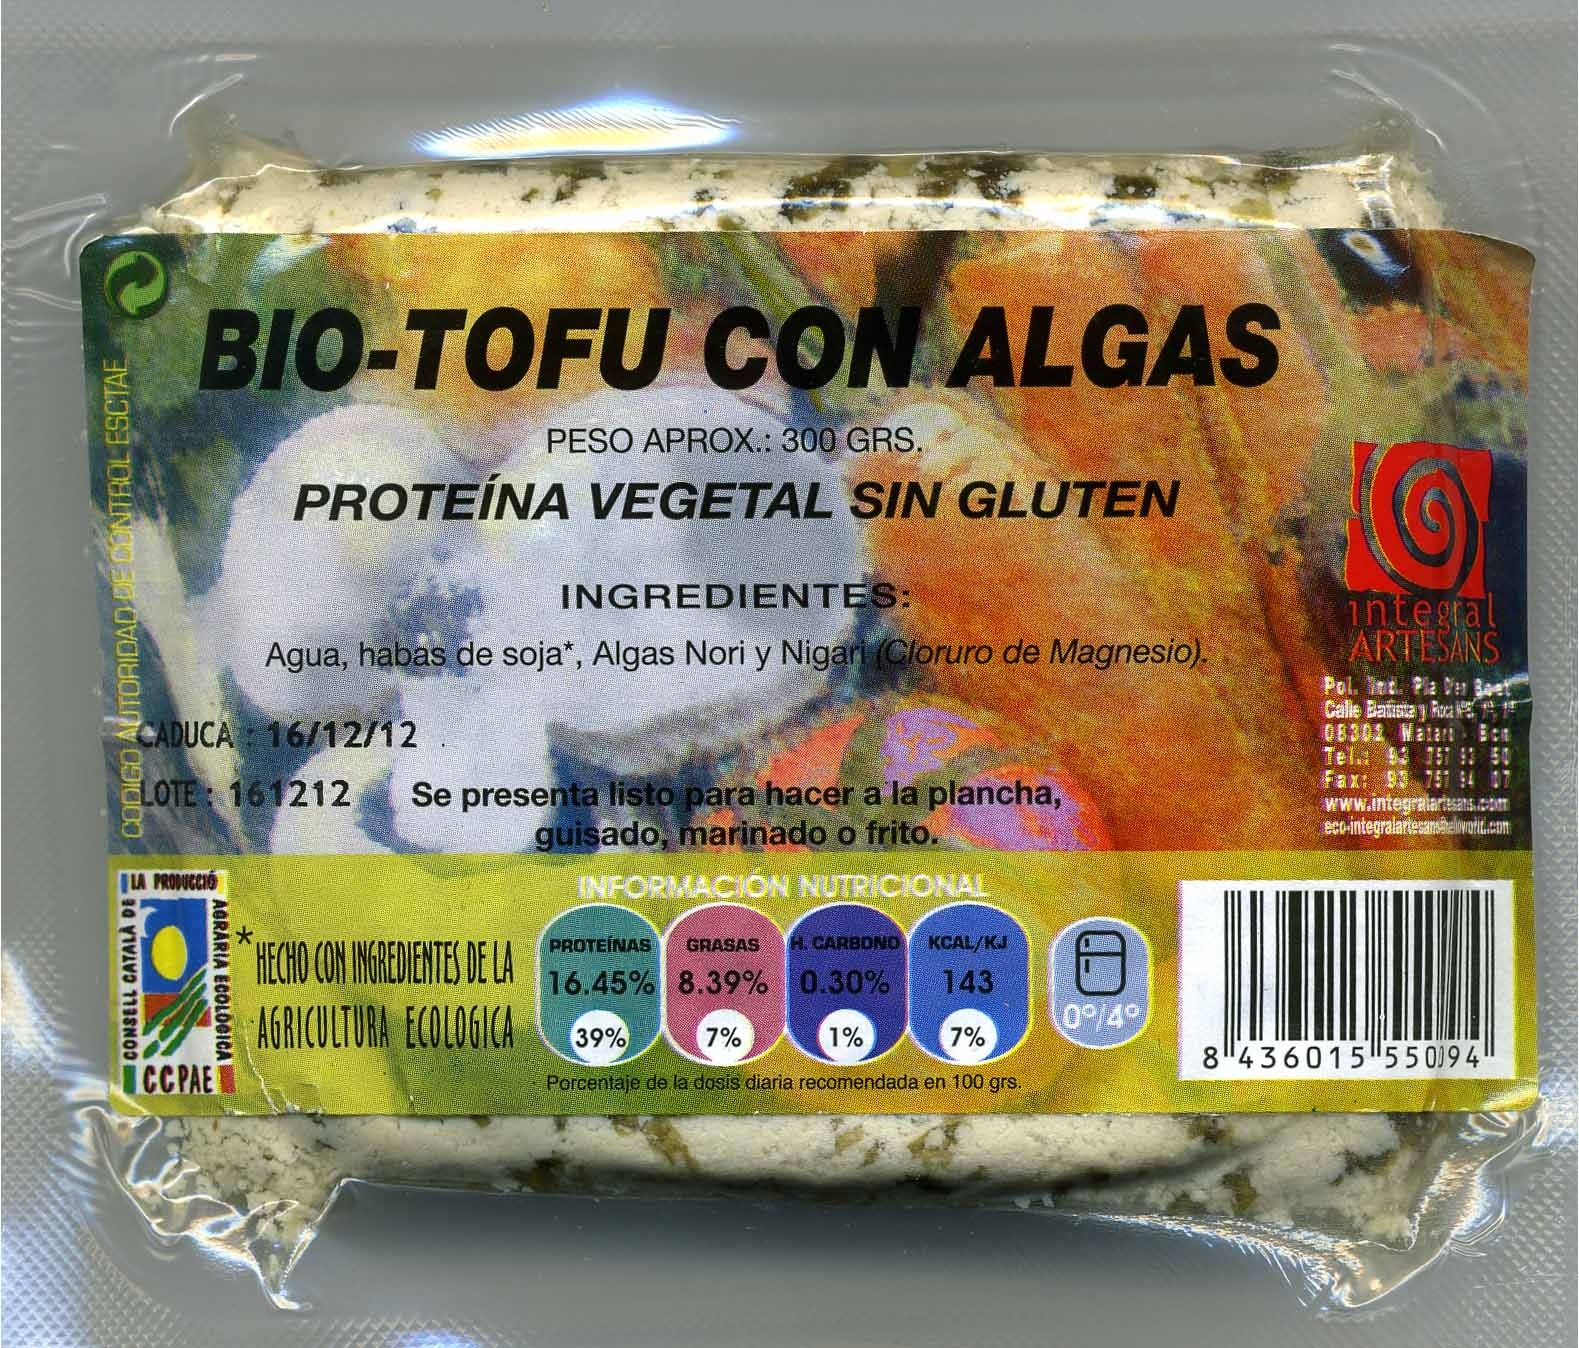 "Tofu ecológico ""Integral Artesans"" con algas - Produit"